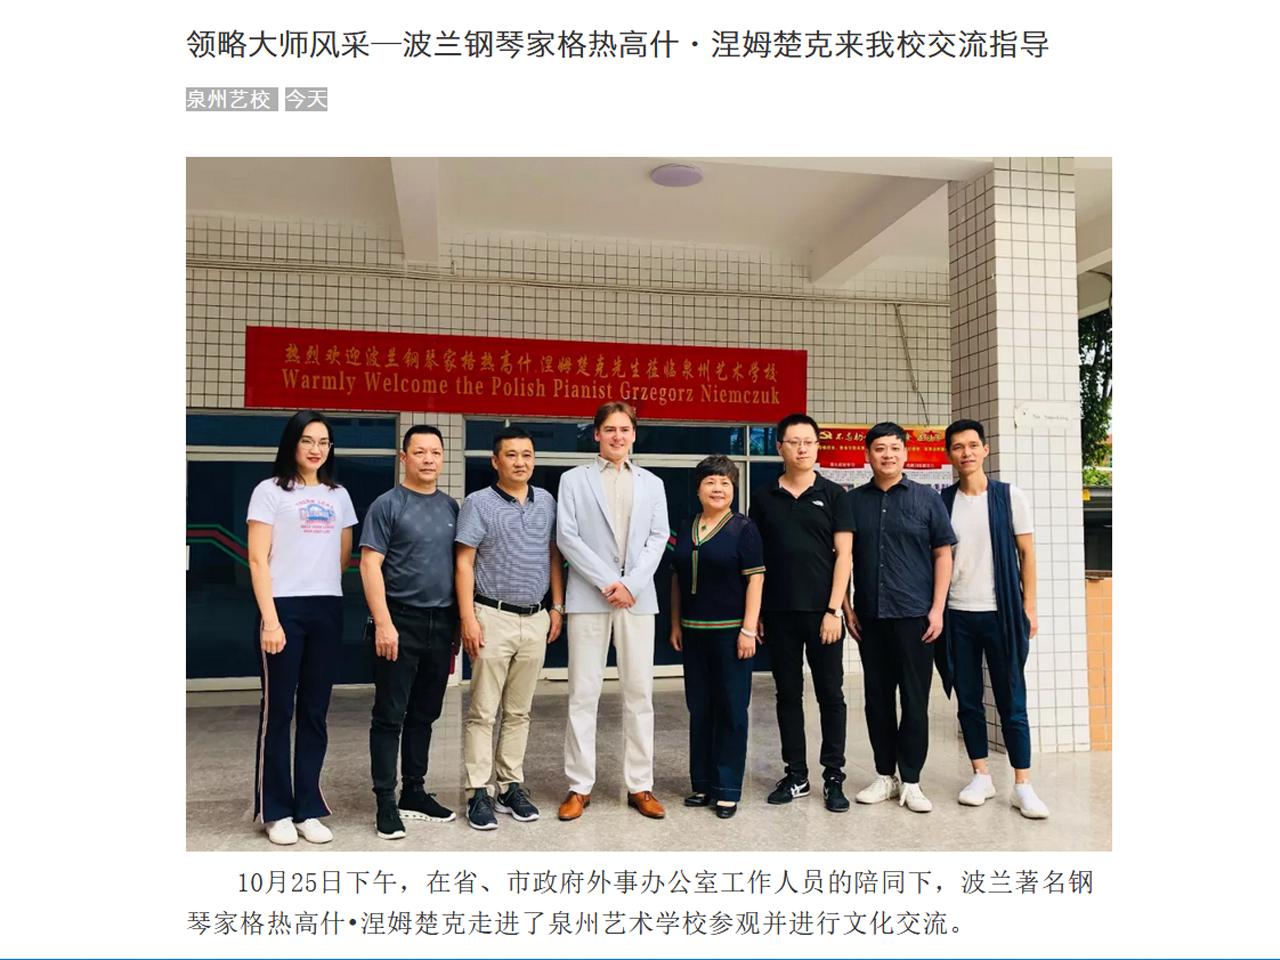 20191026_mp.weixin.qq.com